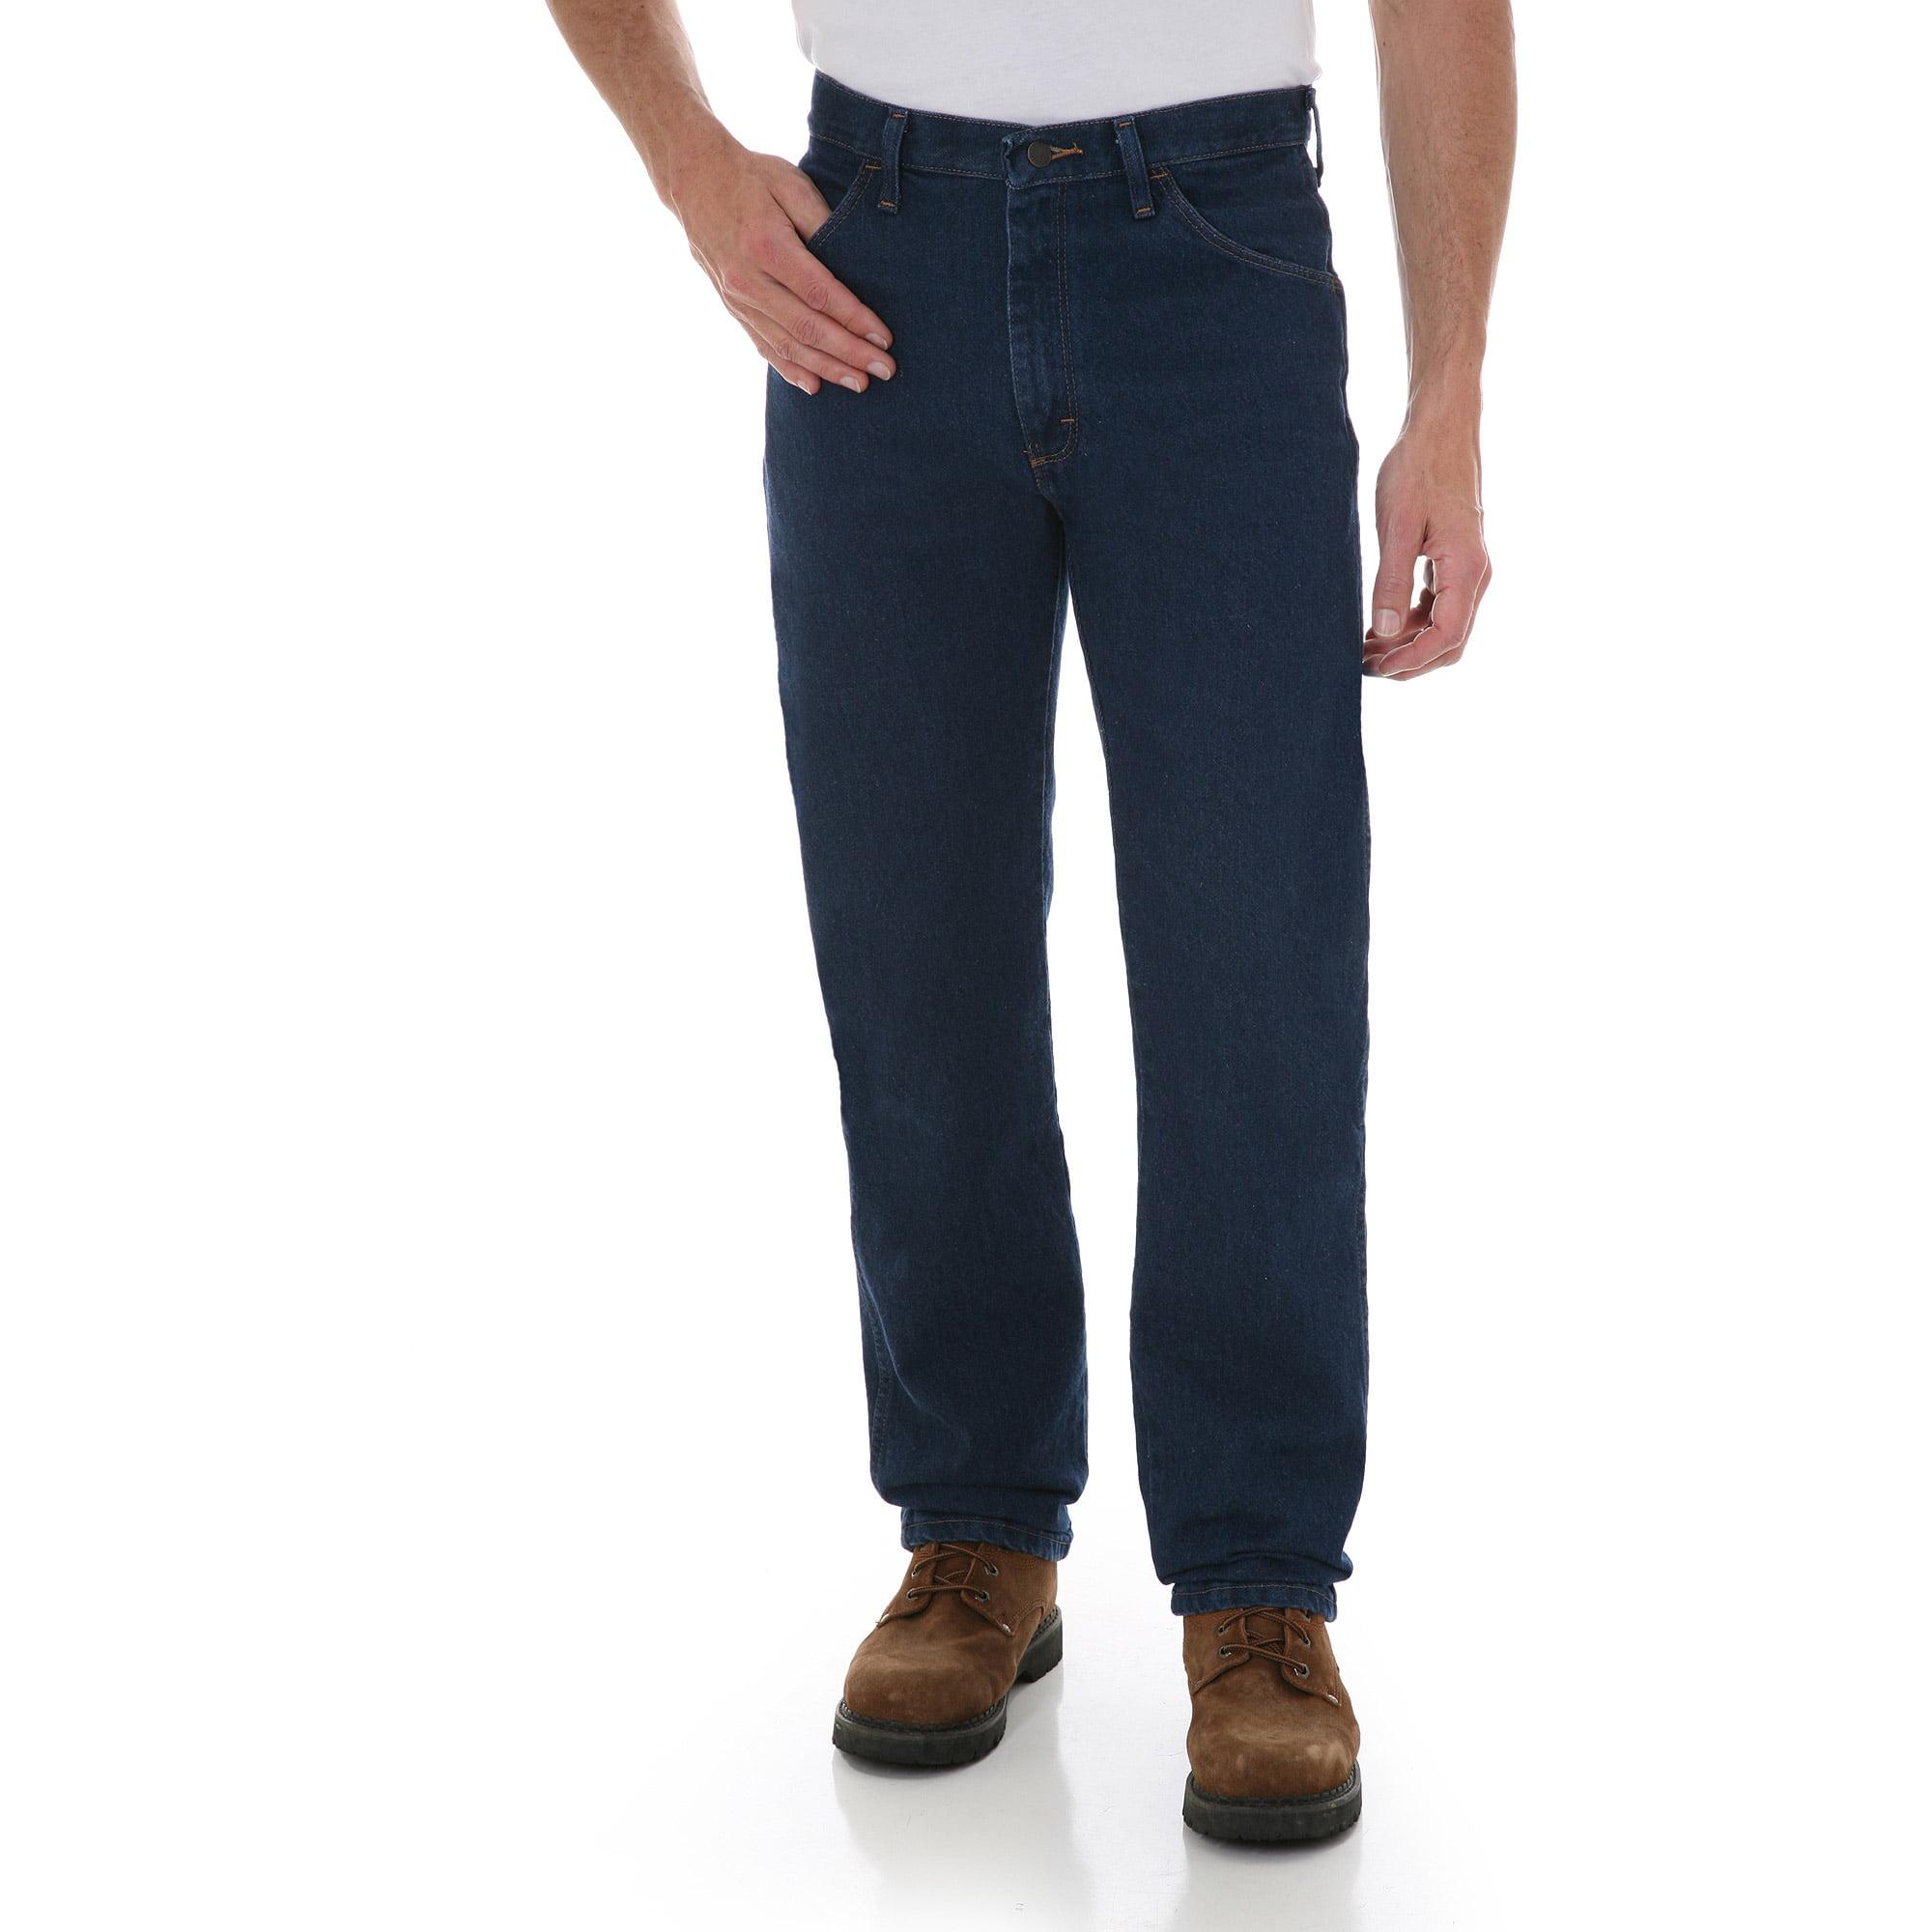 Rustler - Tall Men's Regular Fit Straight-Leg Jeans